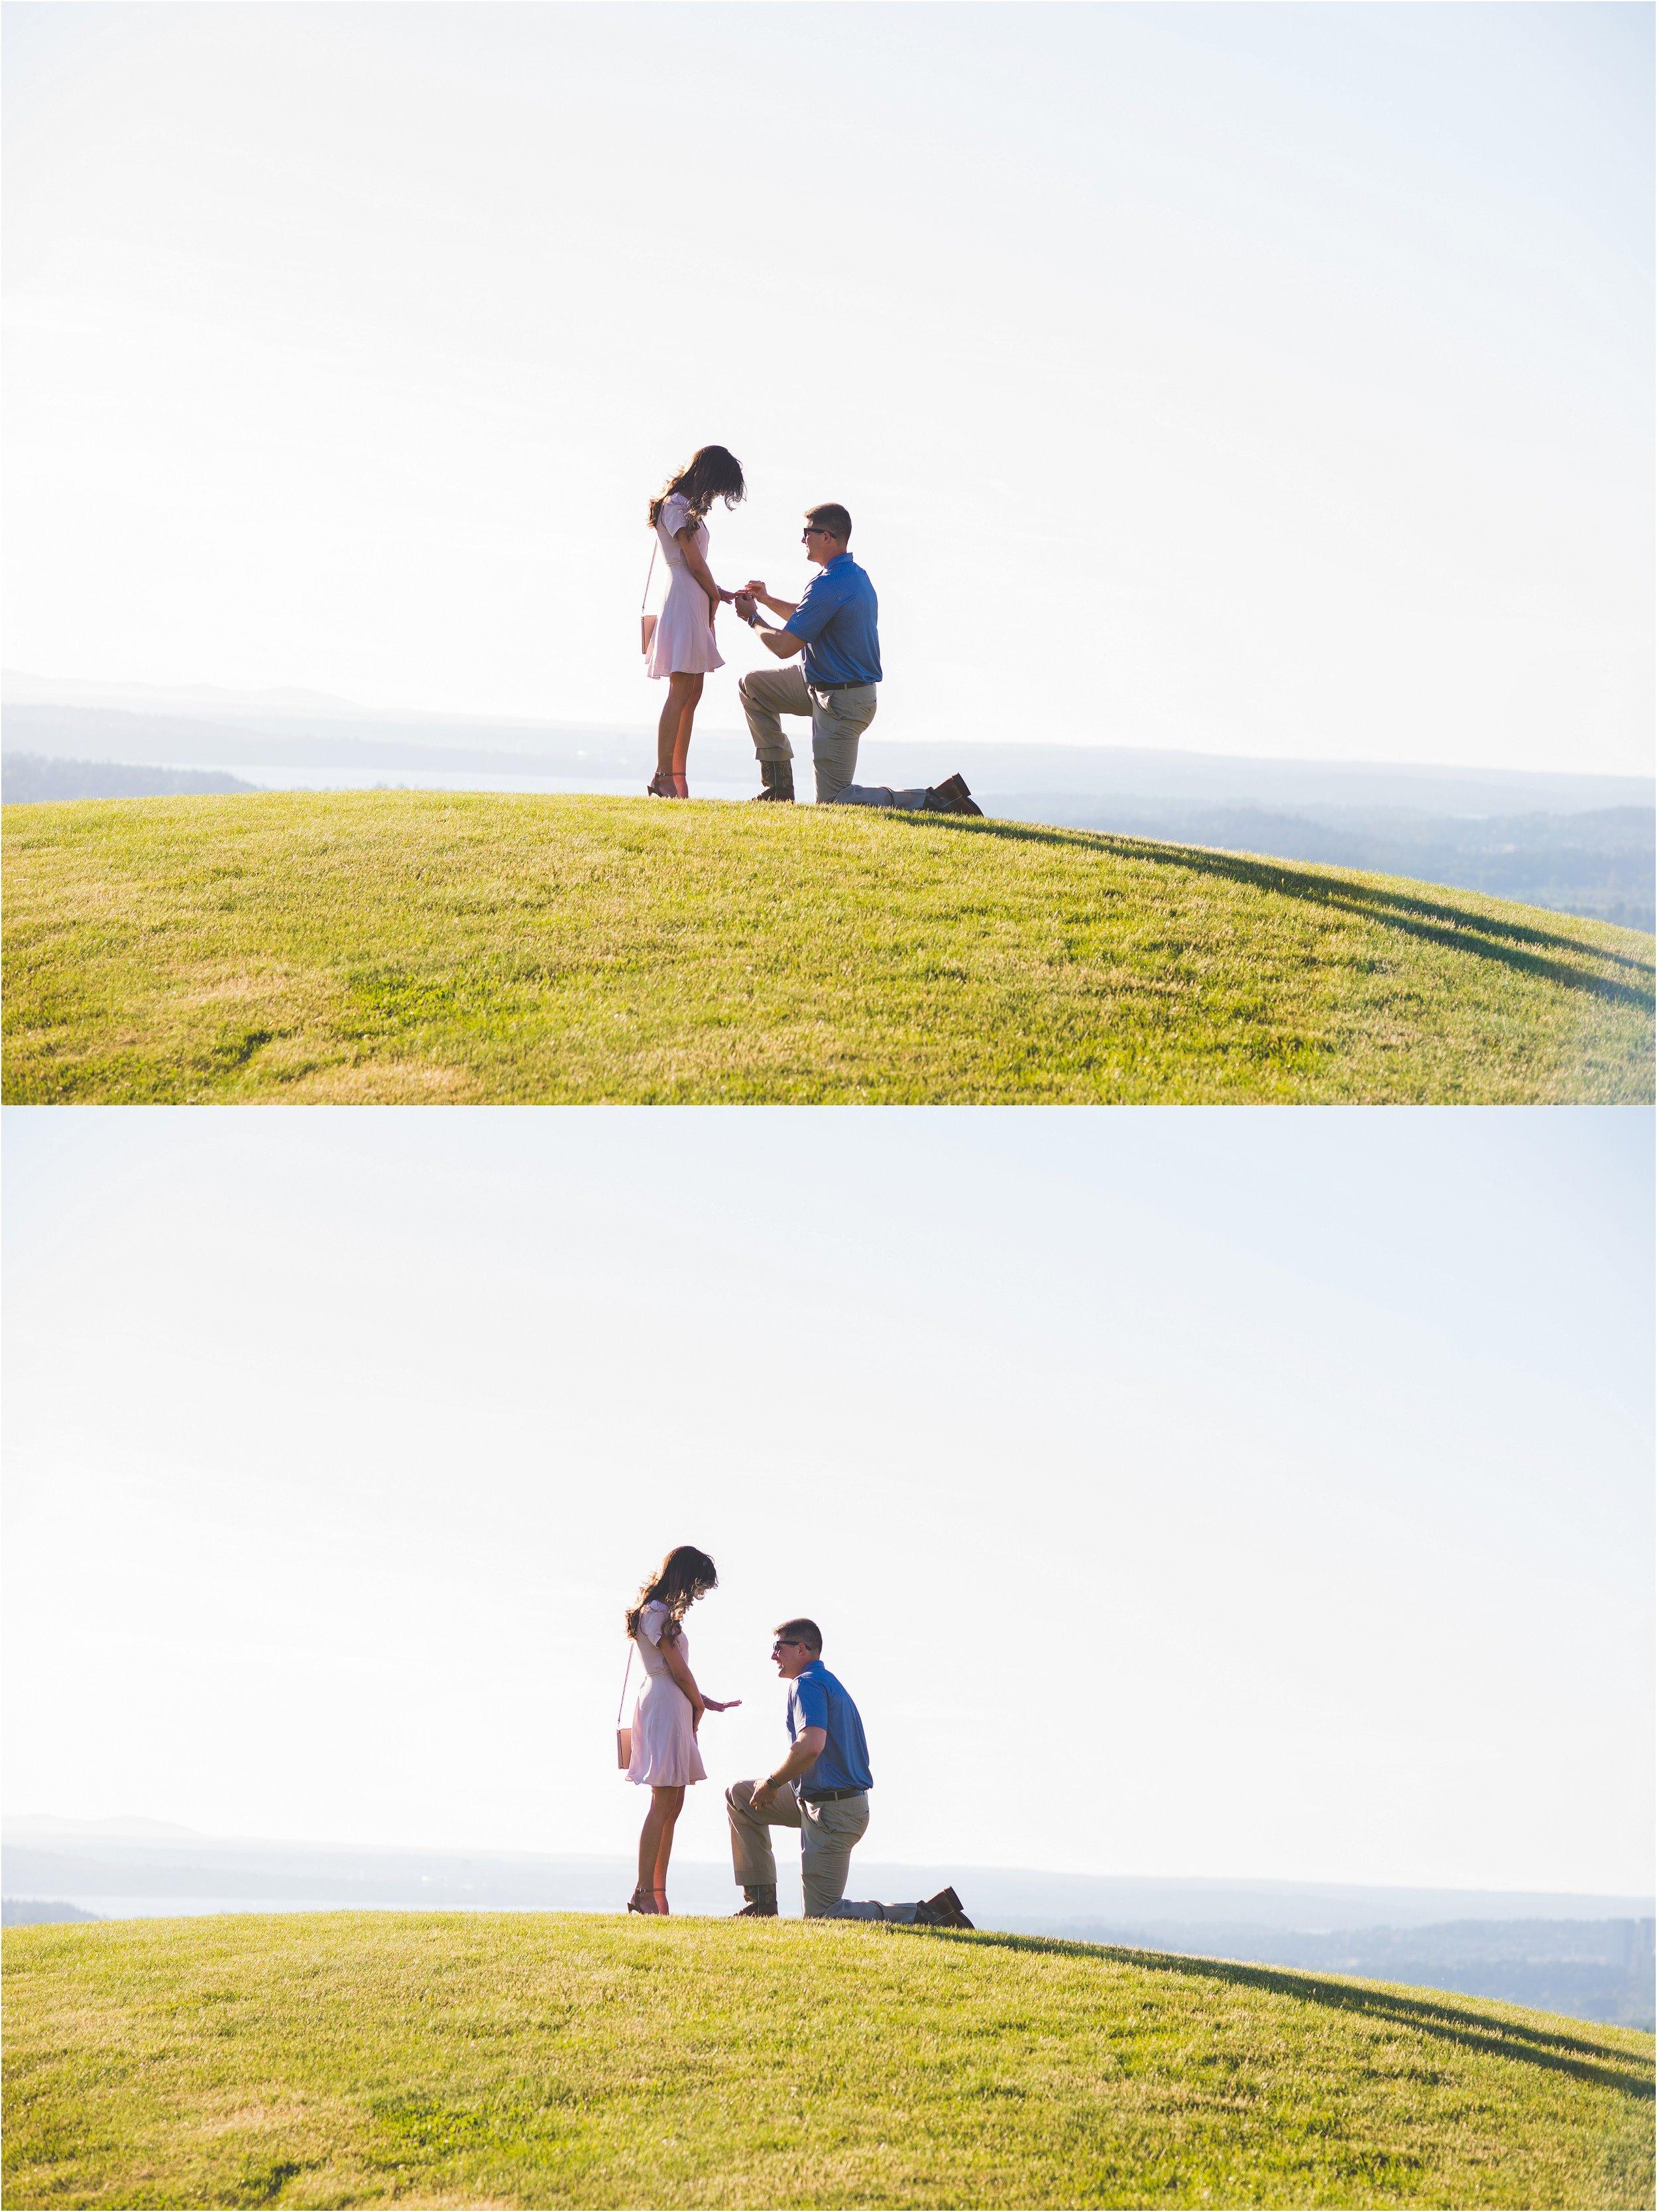 newcastle-golf-club-proposal-jannicka-mayte-seattle-washington-engagement-wedding-photographer_0005.jpg